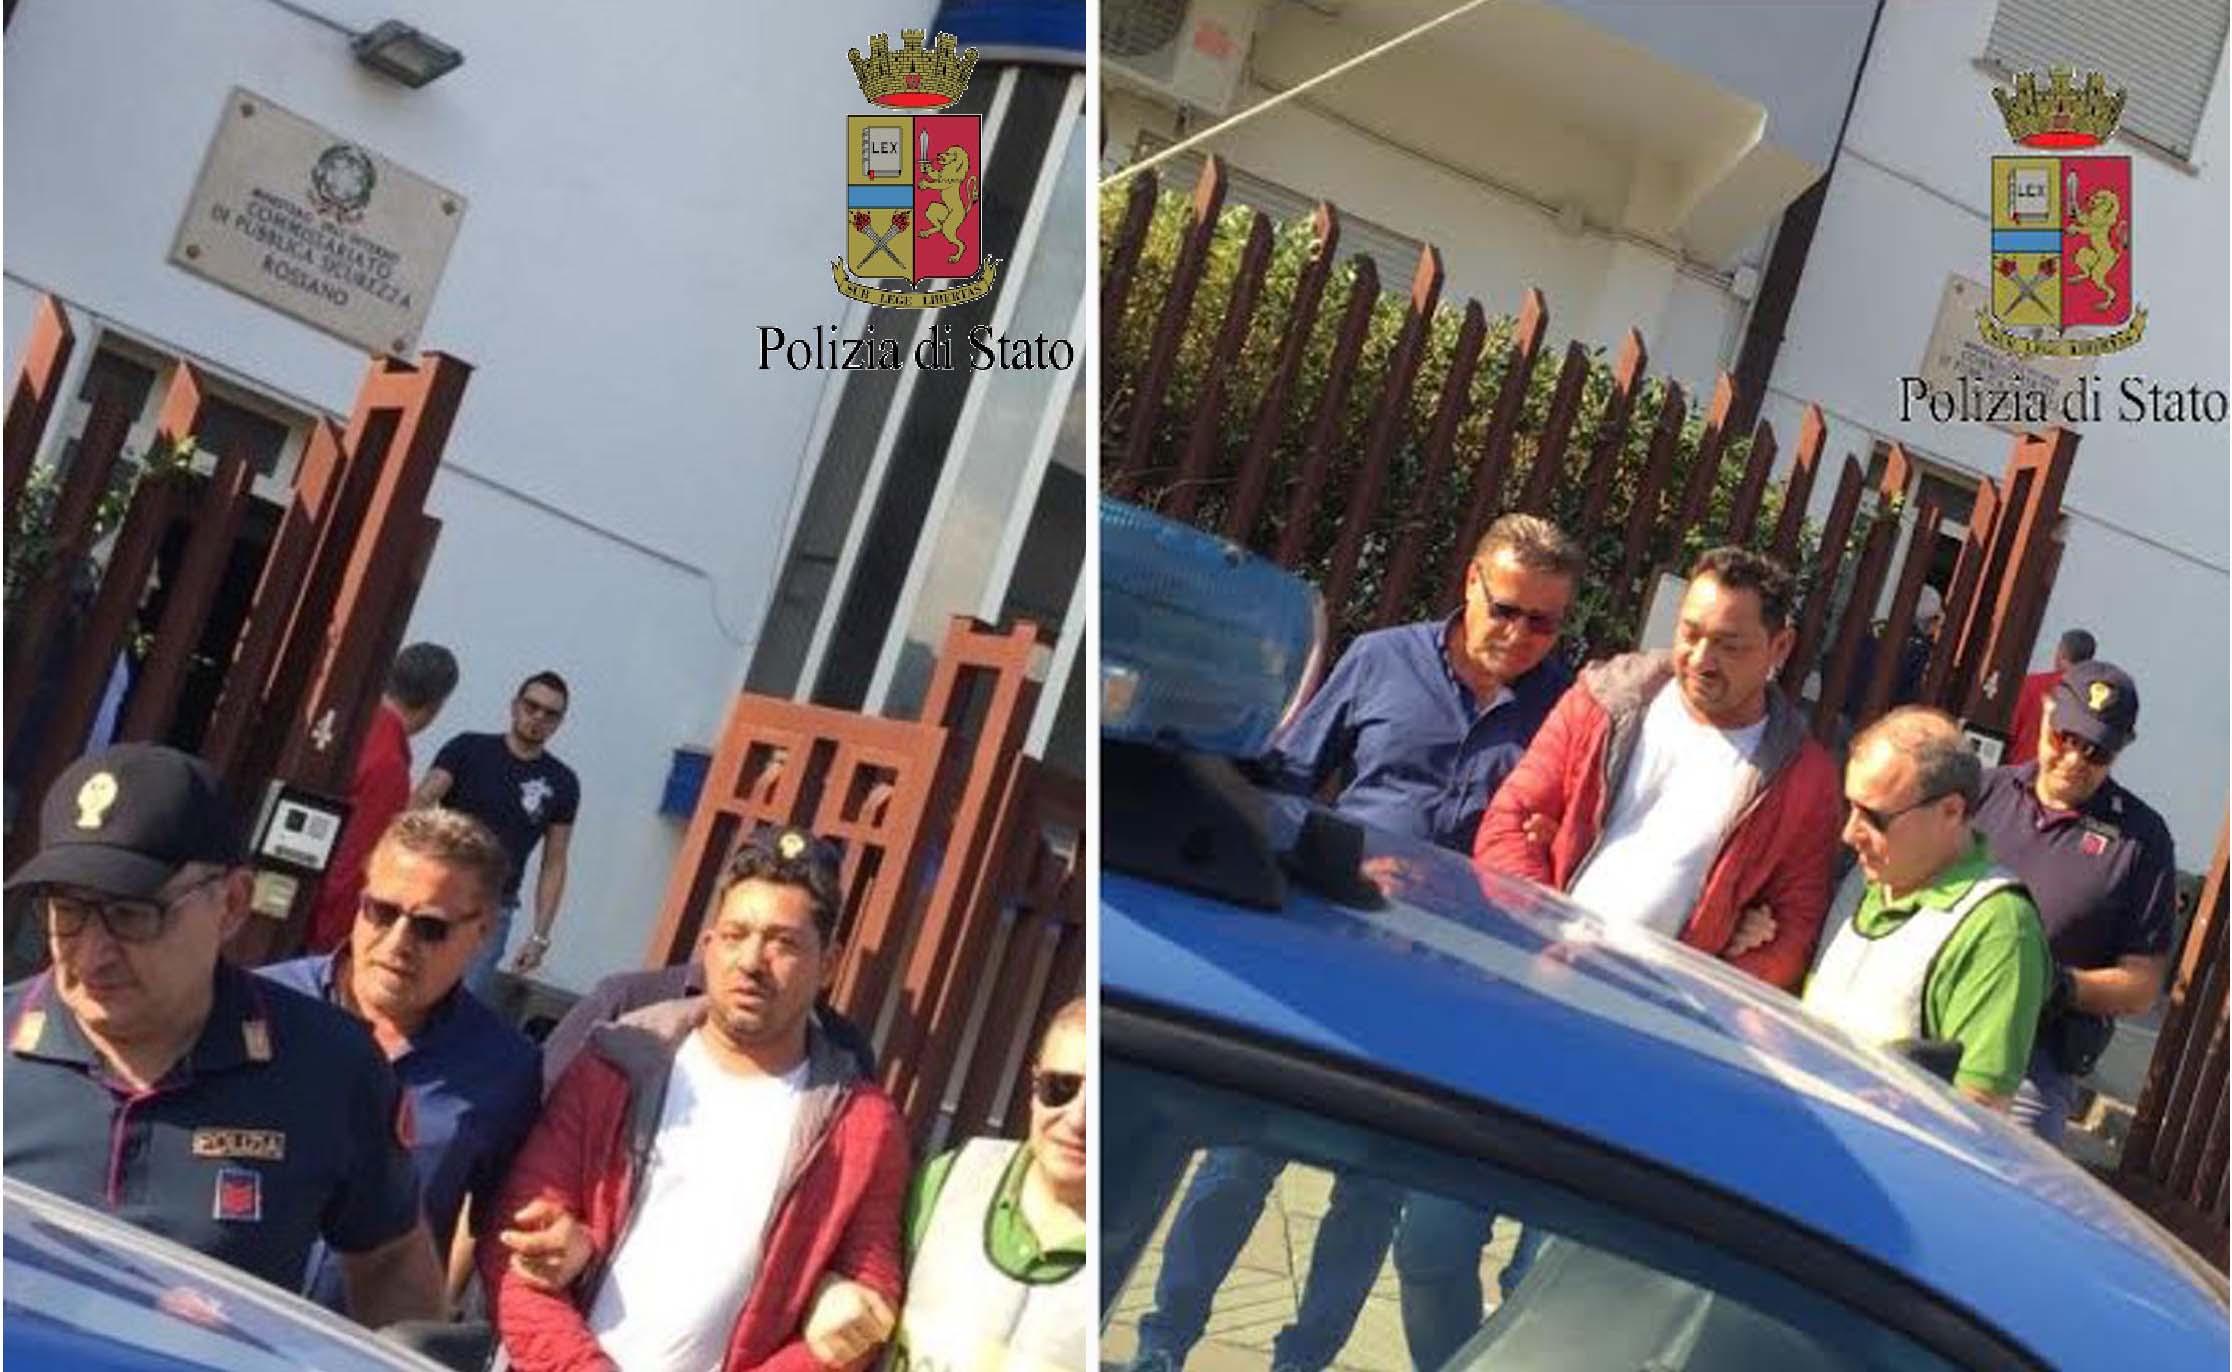 arresto ricercato serbo